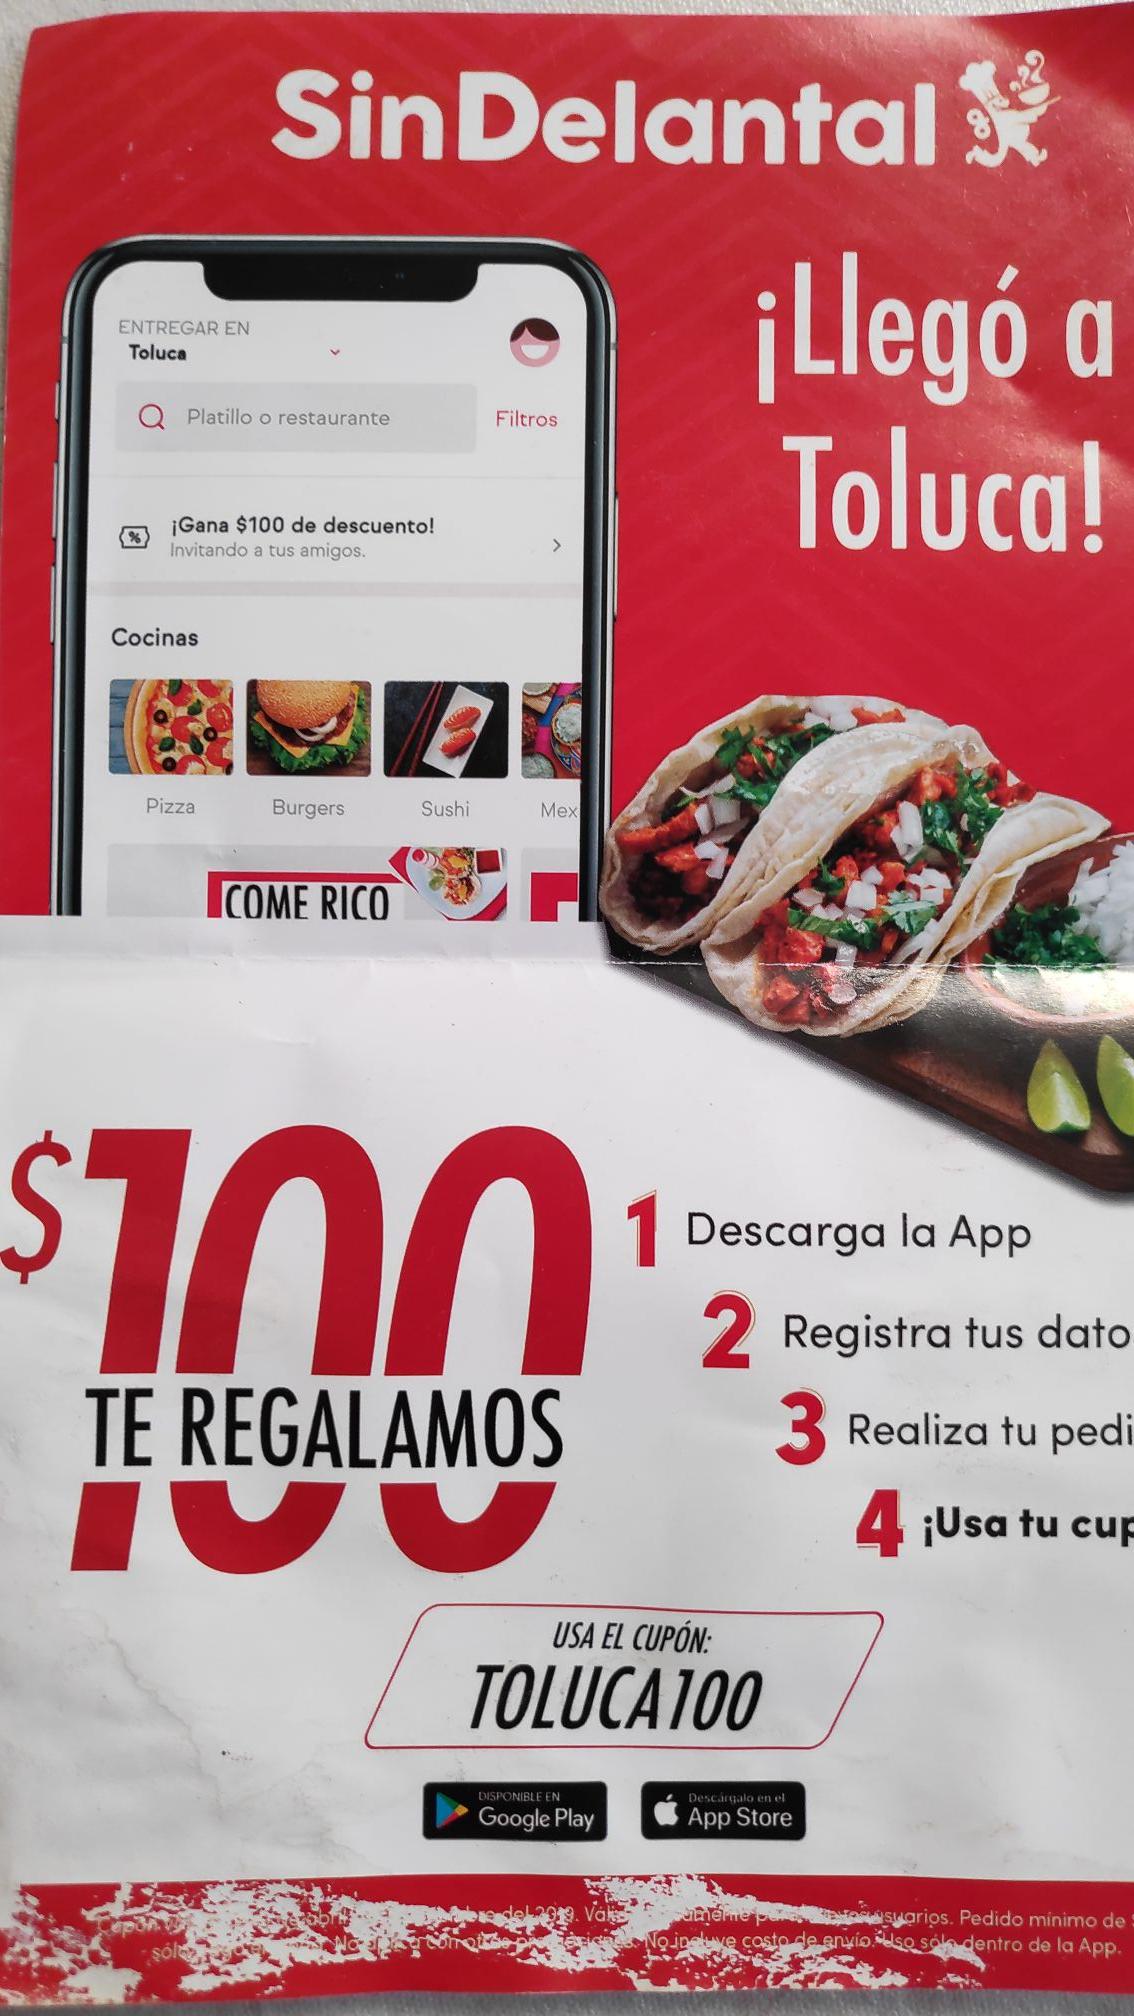 SinDelantal Toluca: cupón de $100